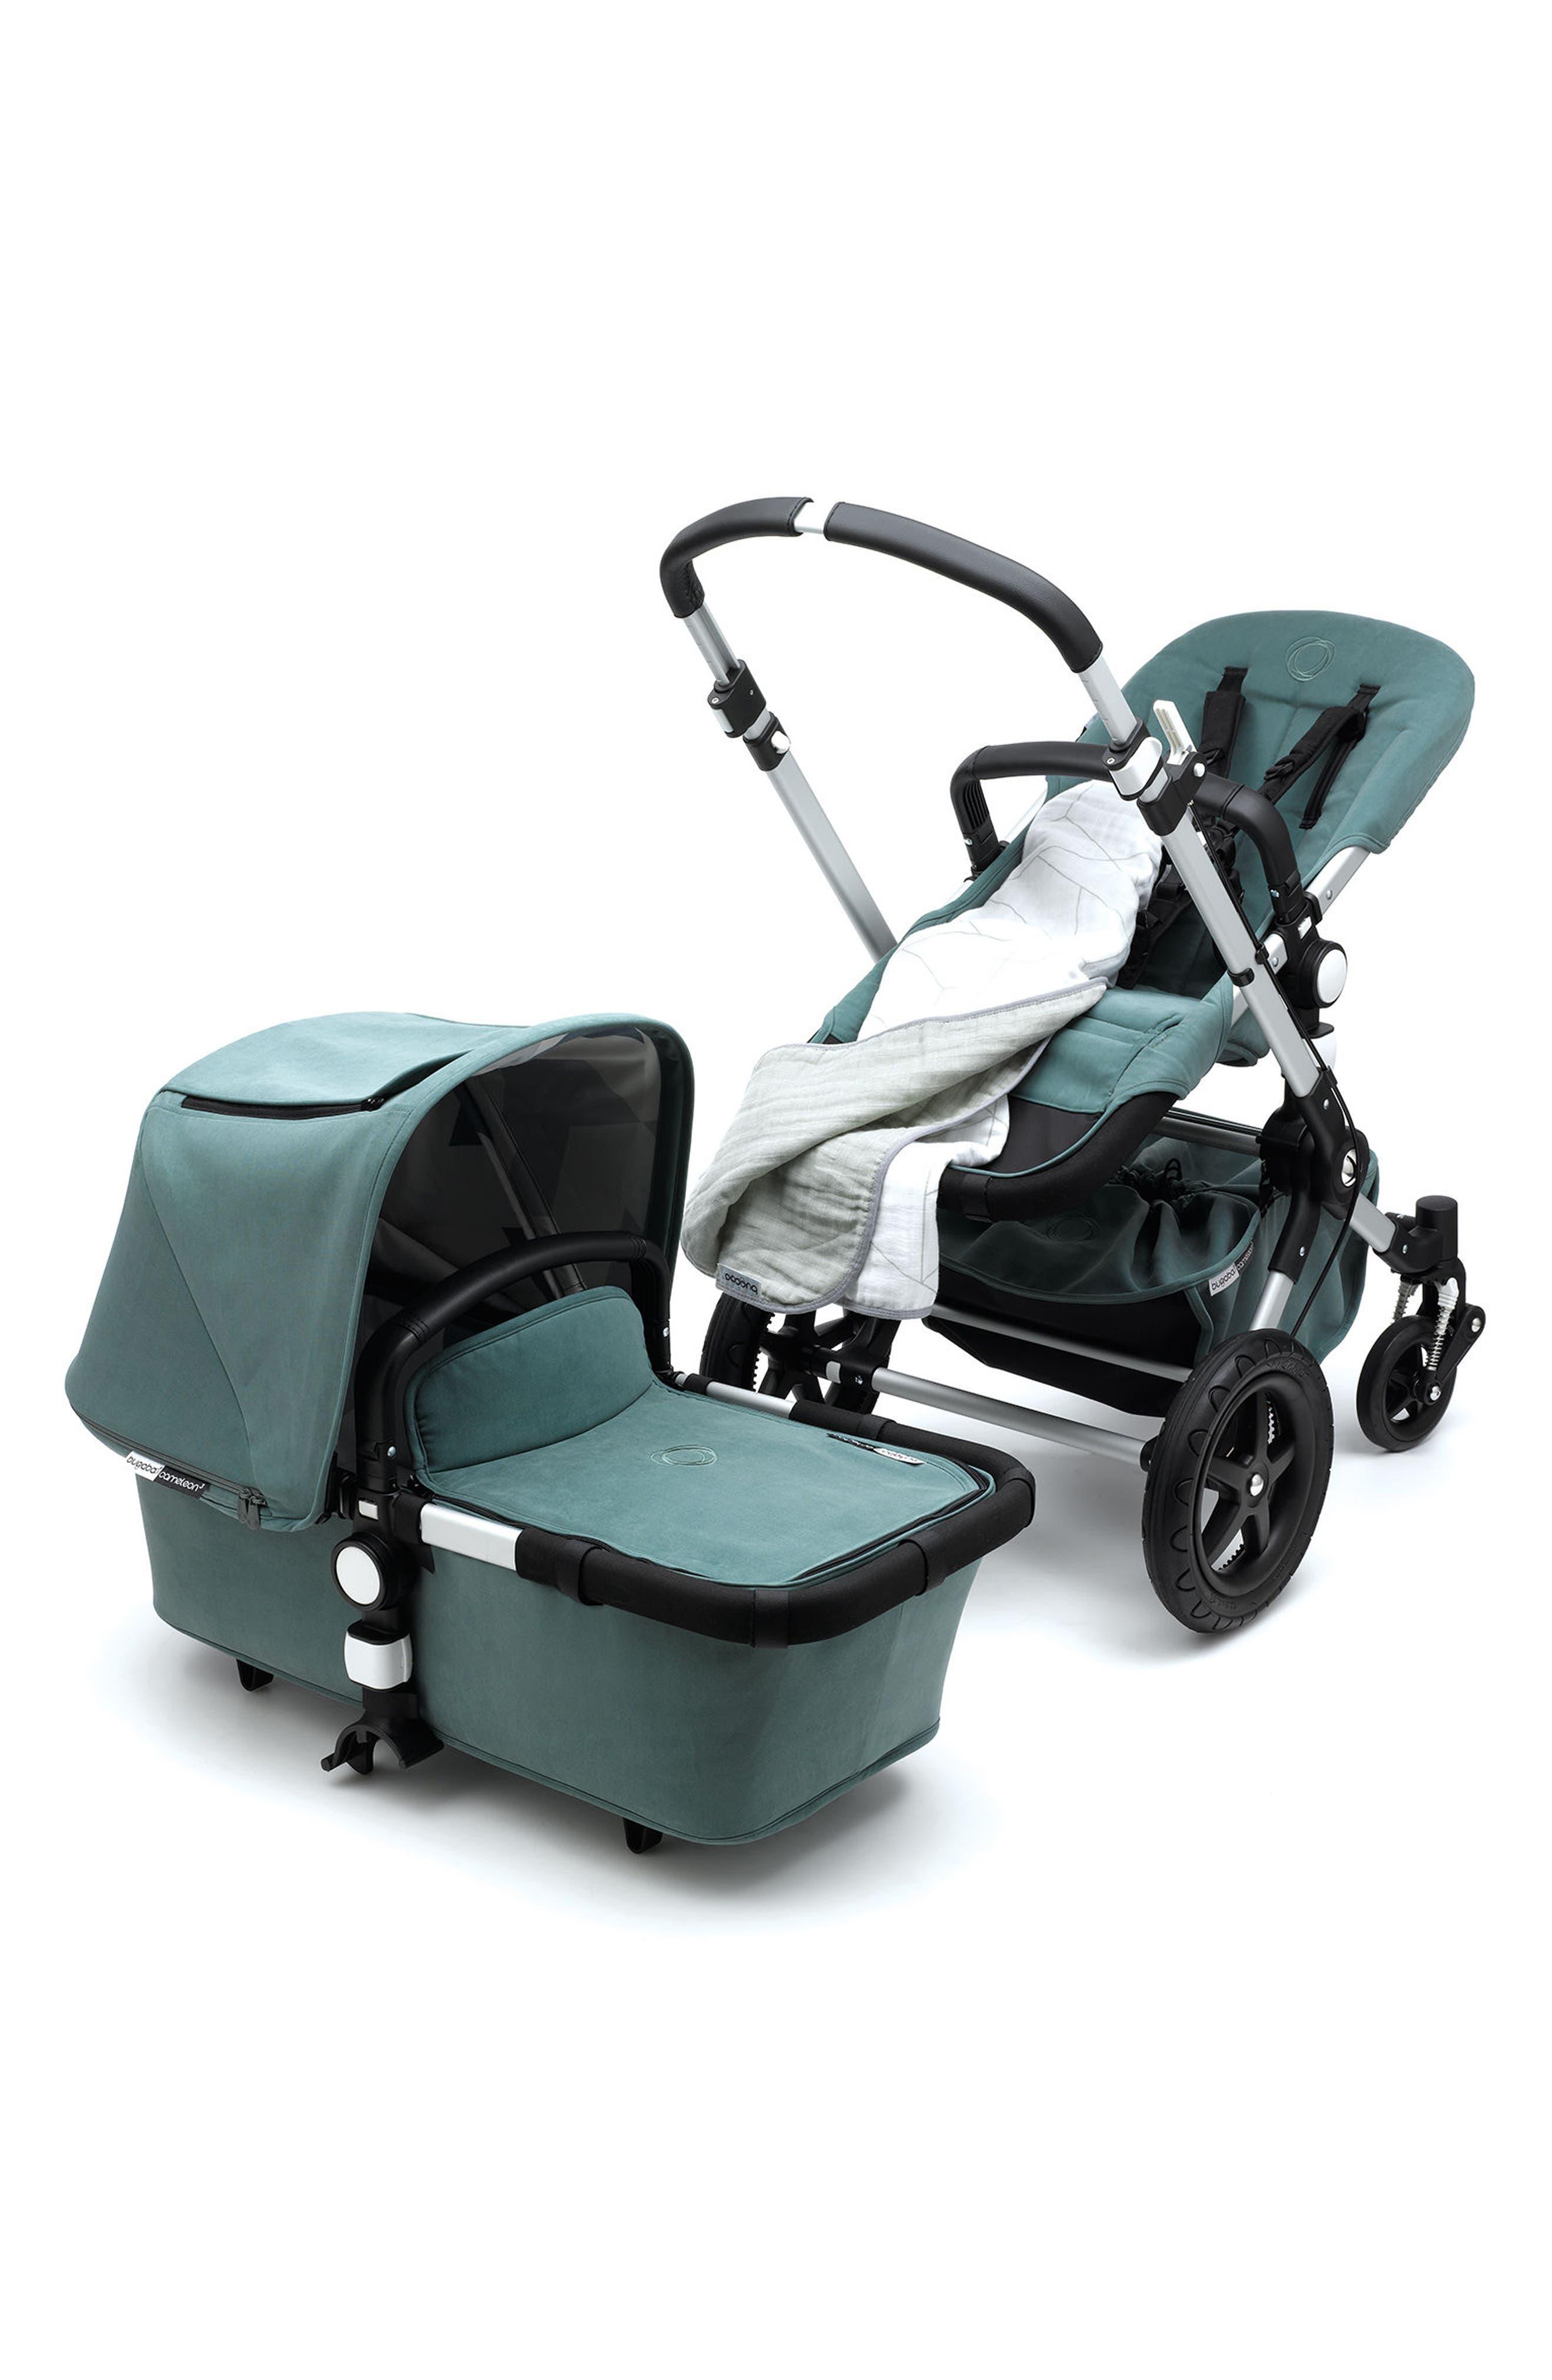 Bugaboo Cameleon³ - Limited Edition Kite Stroller